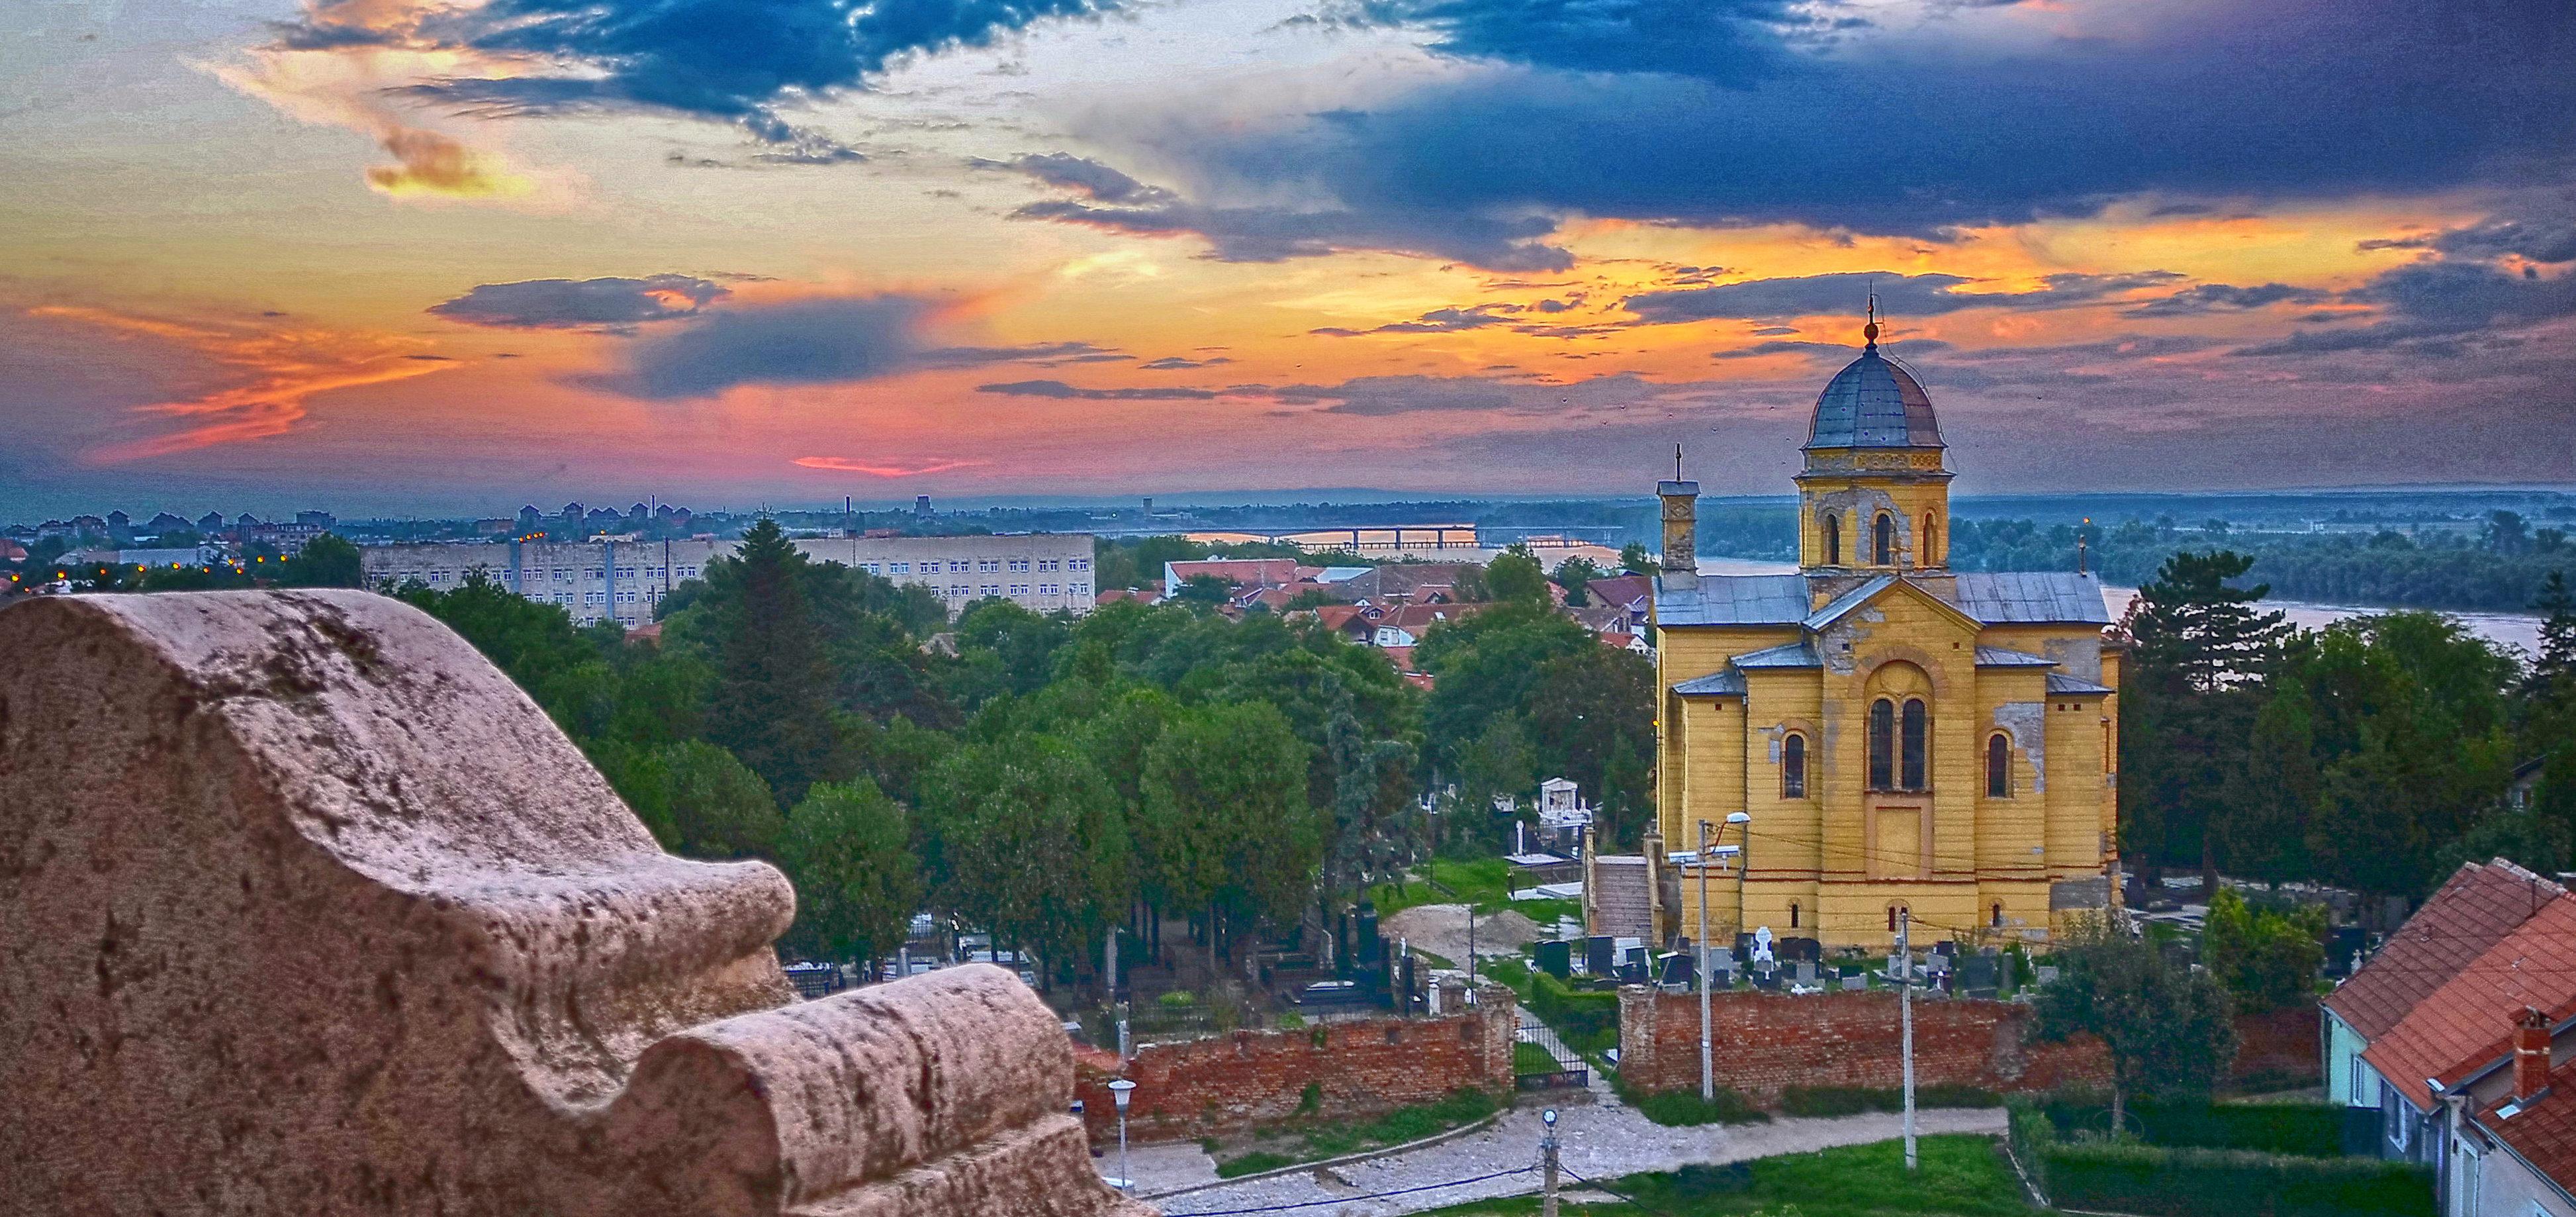 Земун – австрийский район Белграда